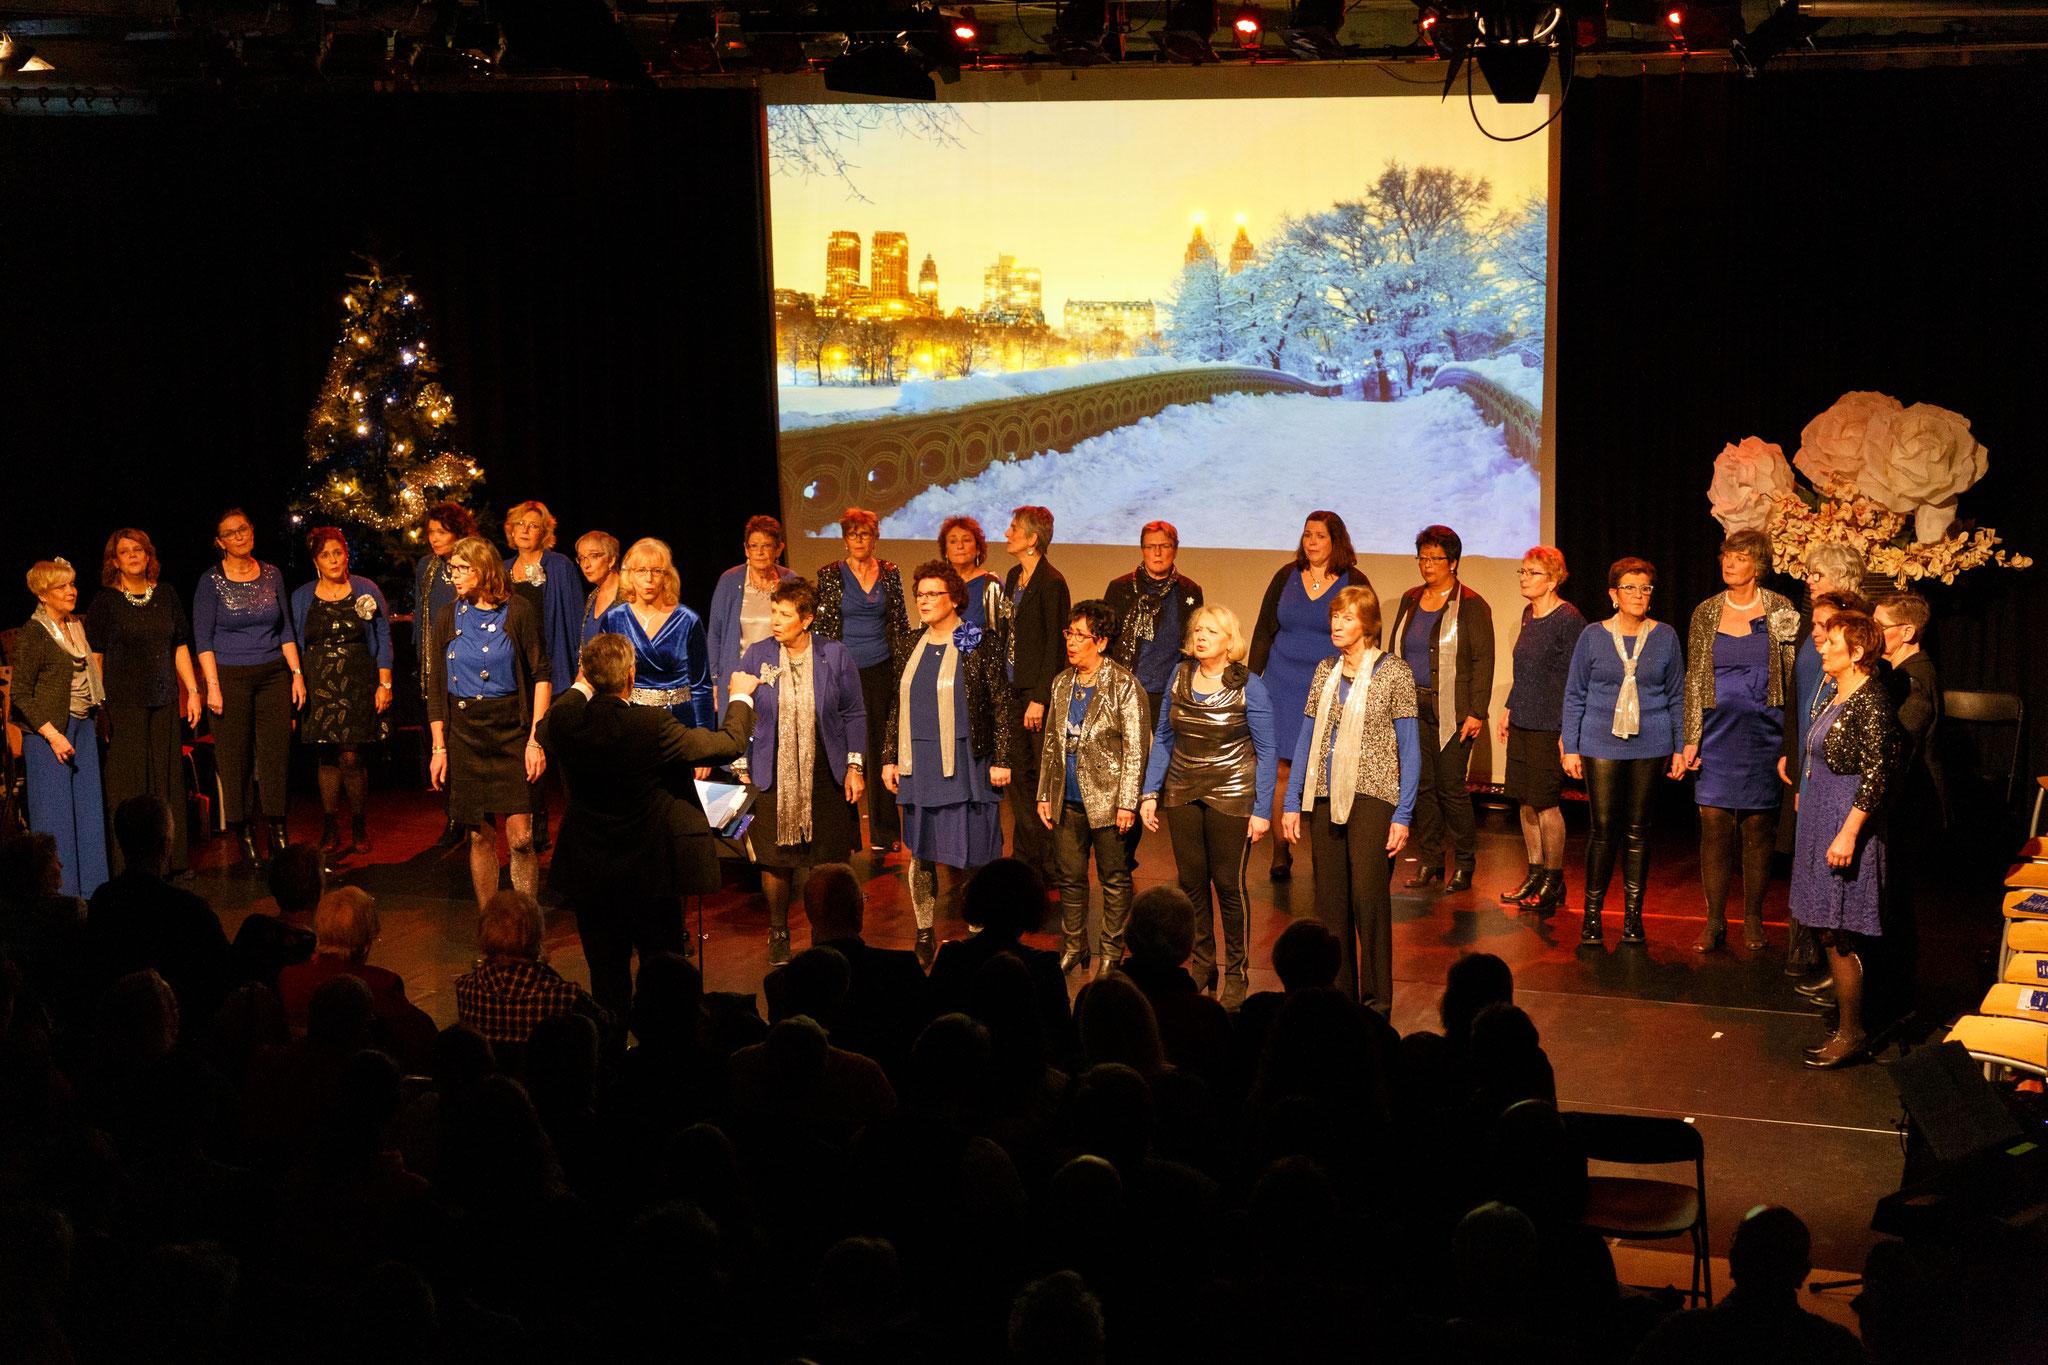 Kerstconcert OtherWise ChristmasWise WorldWide, Culemborg, 23 december 2018